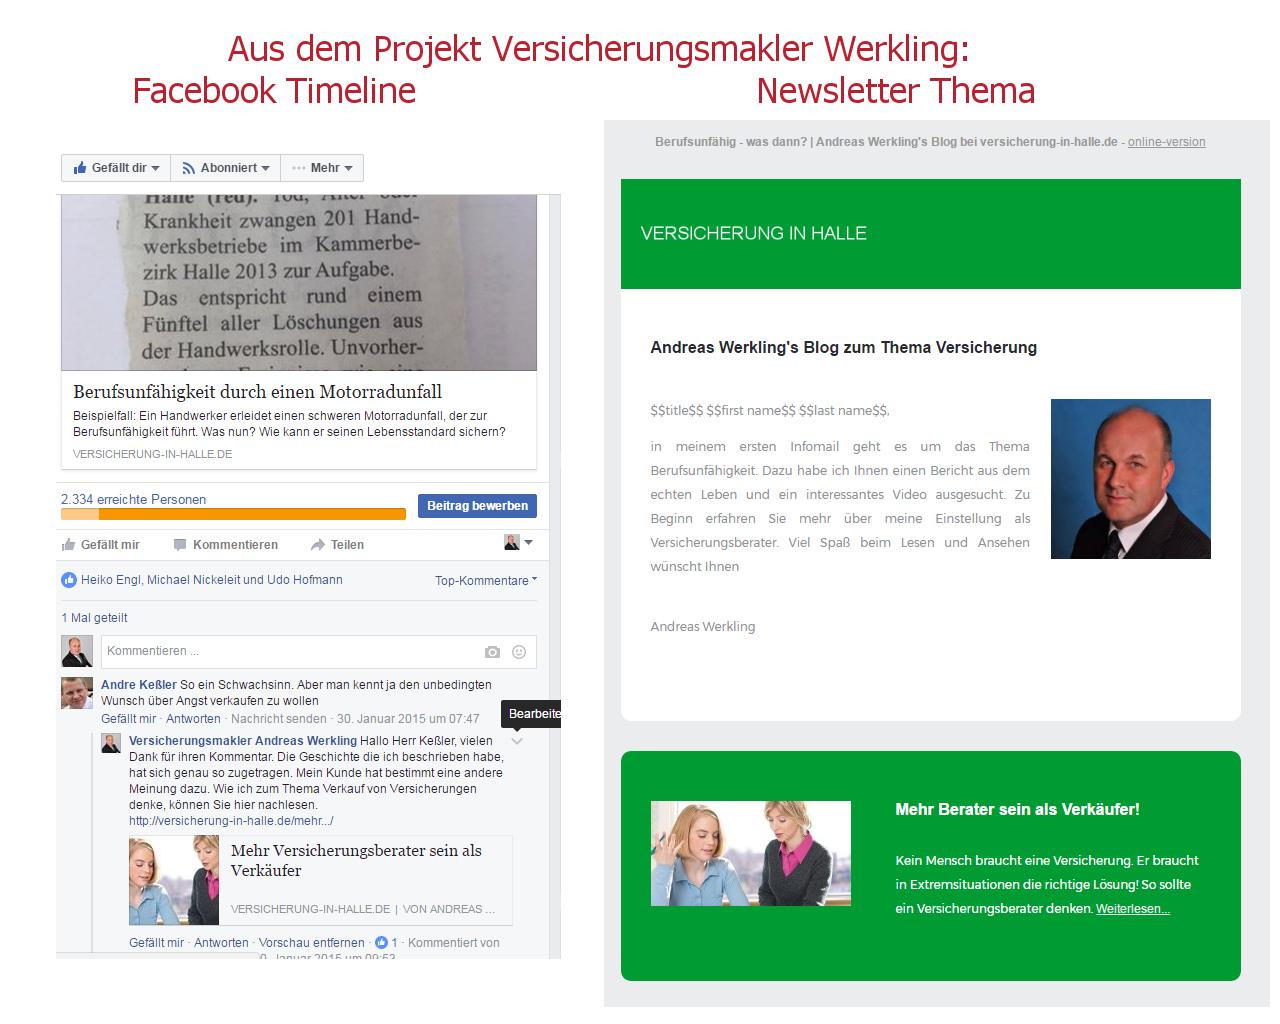 Online-Marketing-Mix - Social Media vs. Newsletter